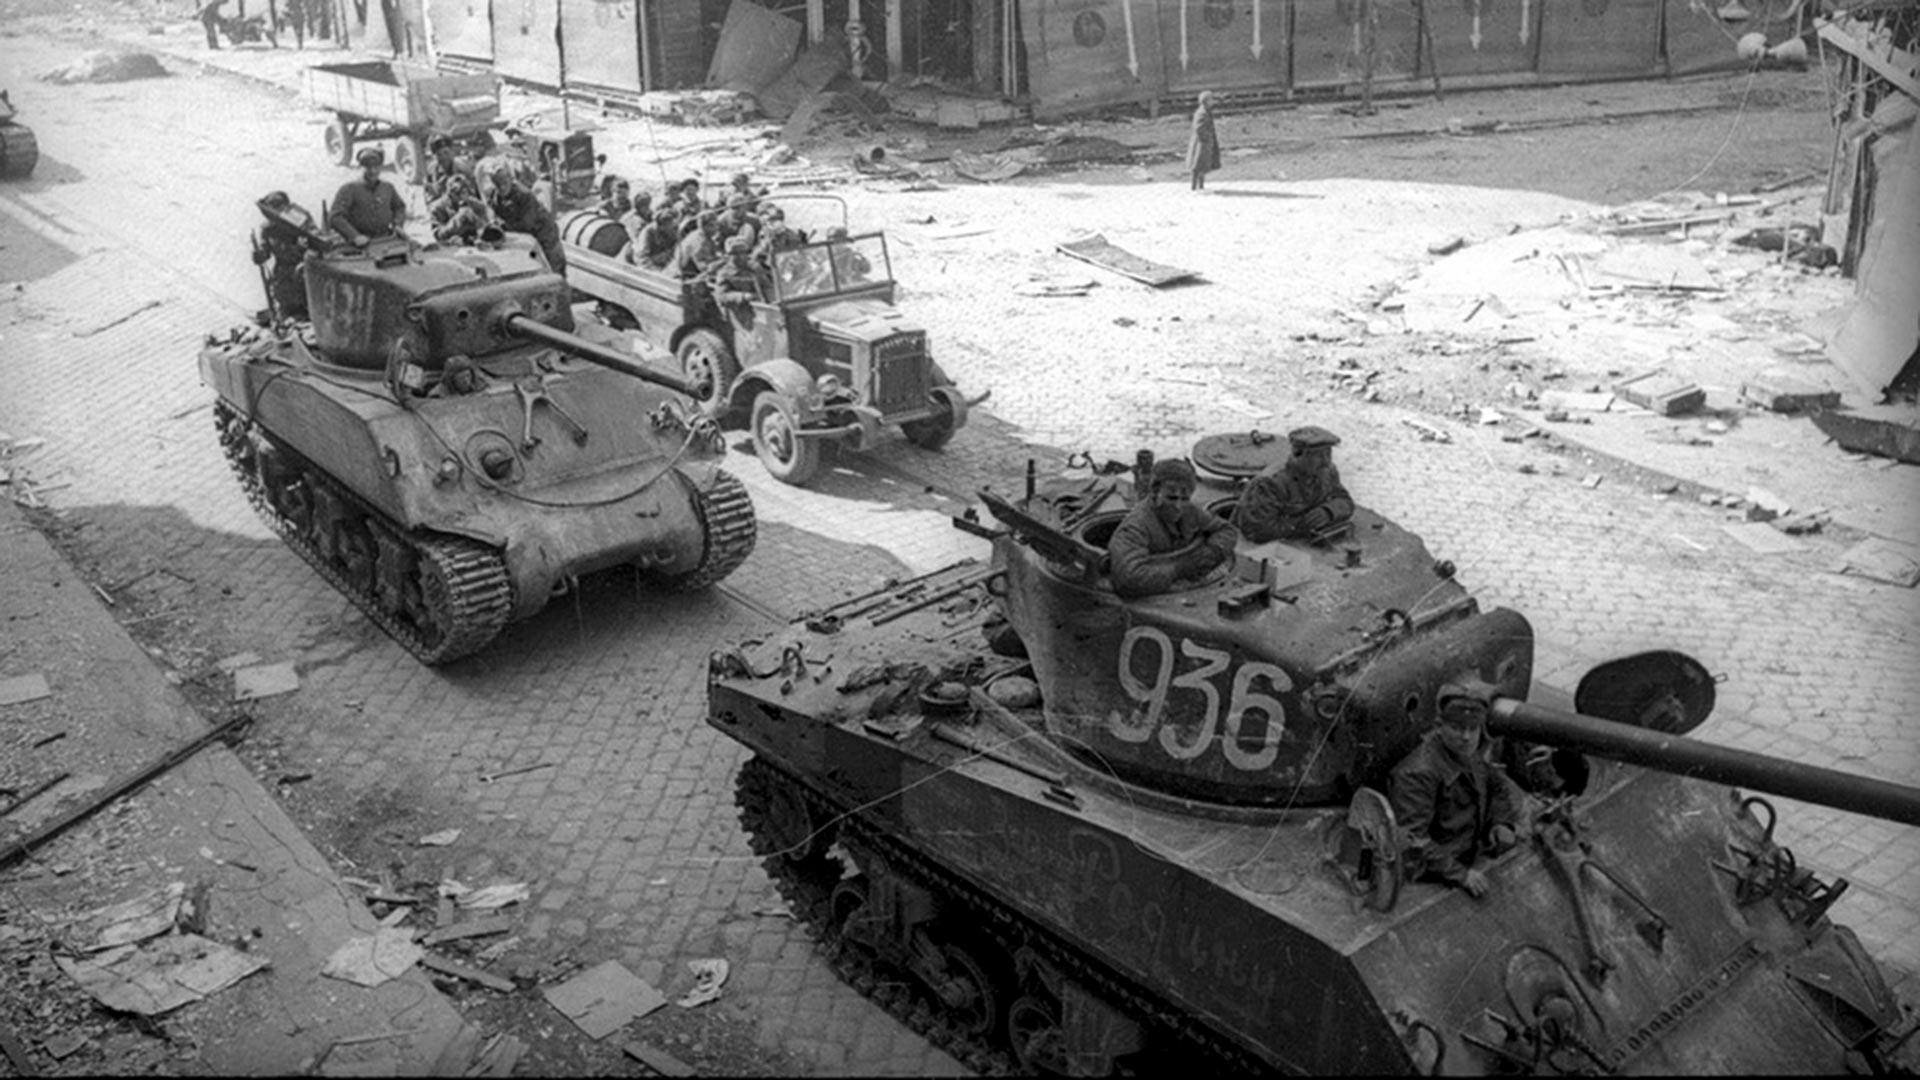 Sowjetische Panzer in Wien